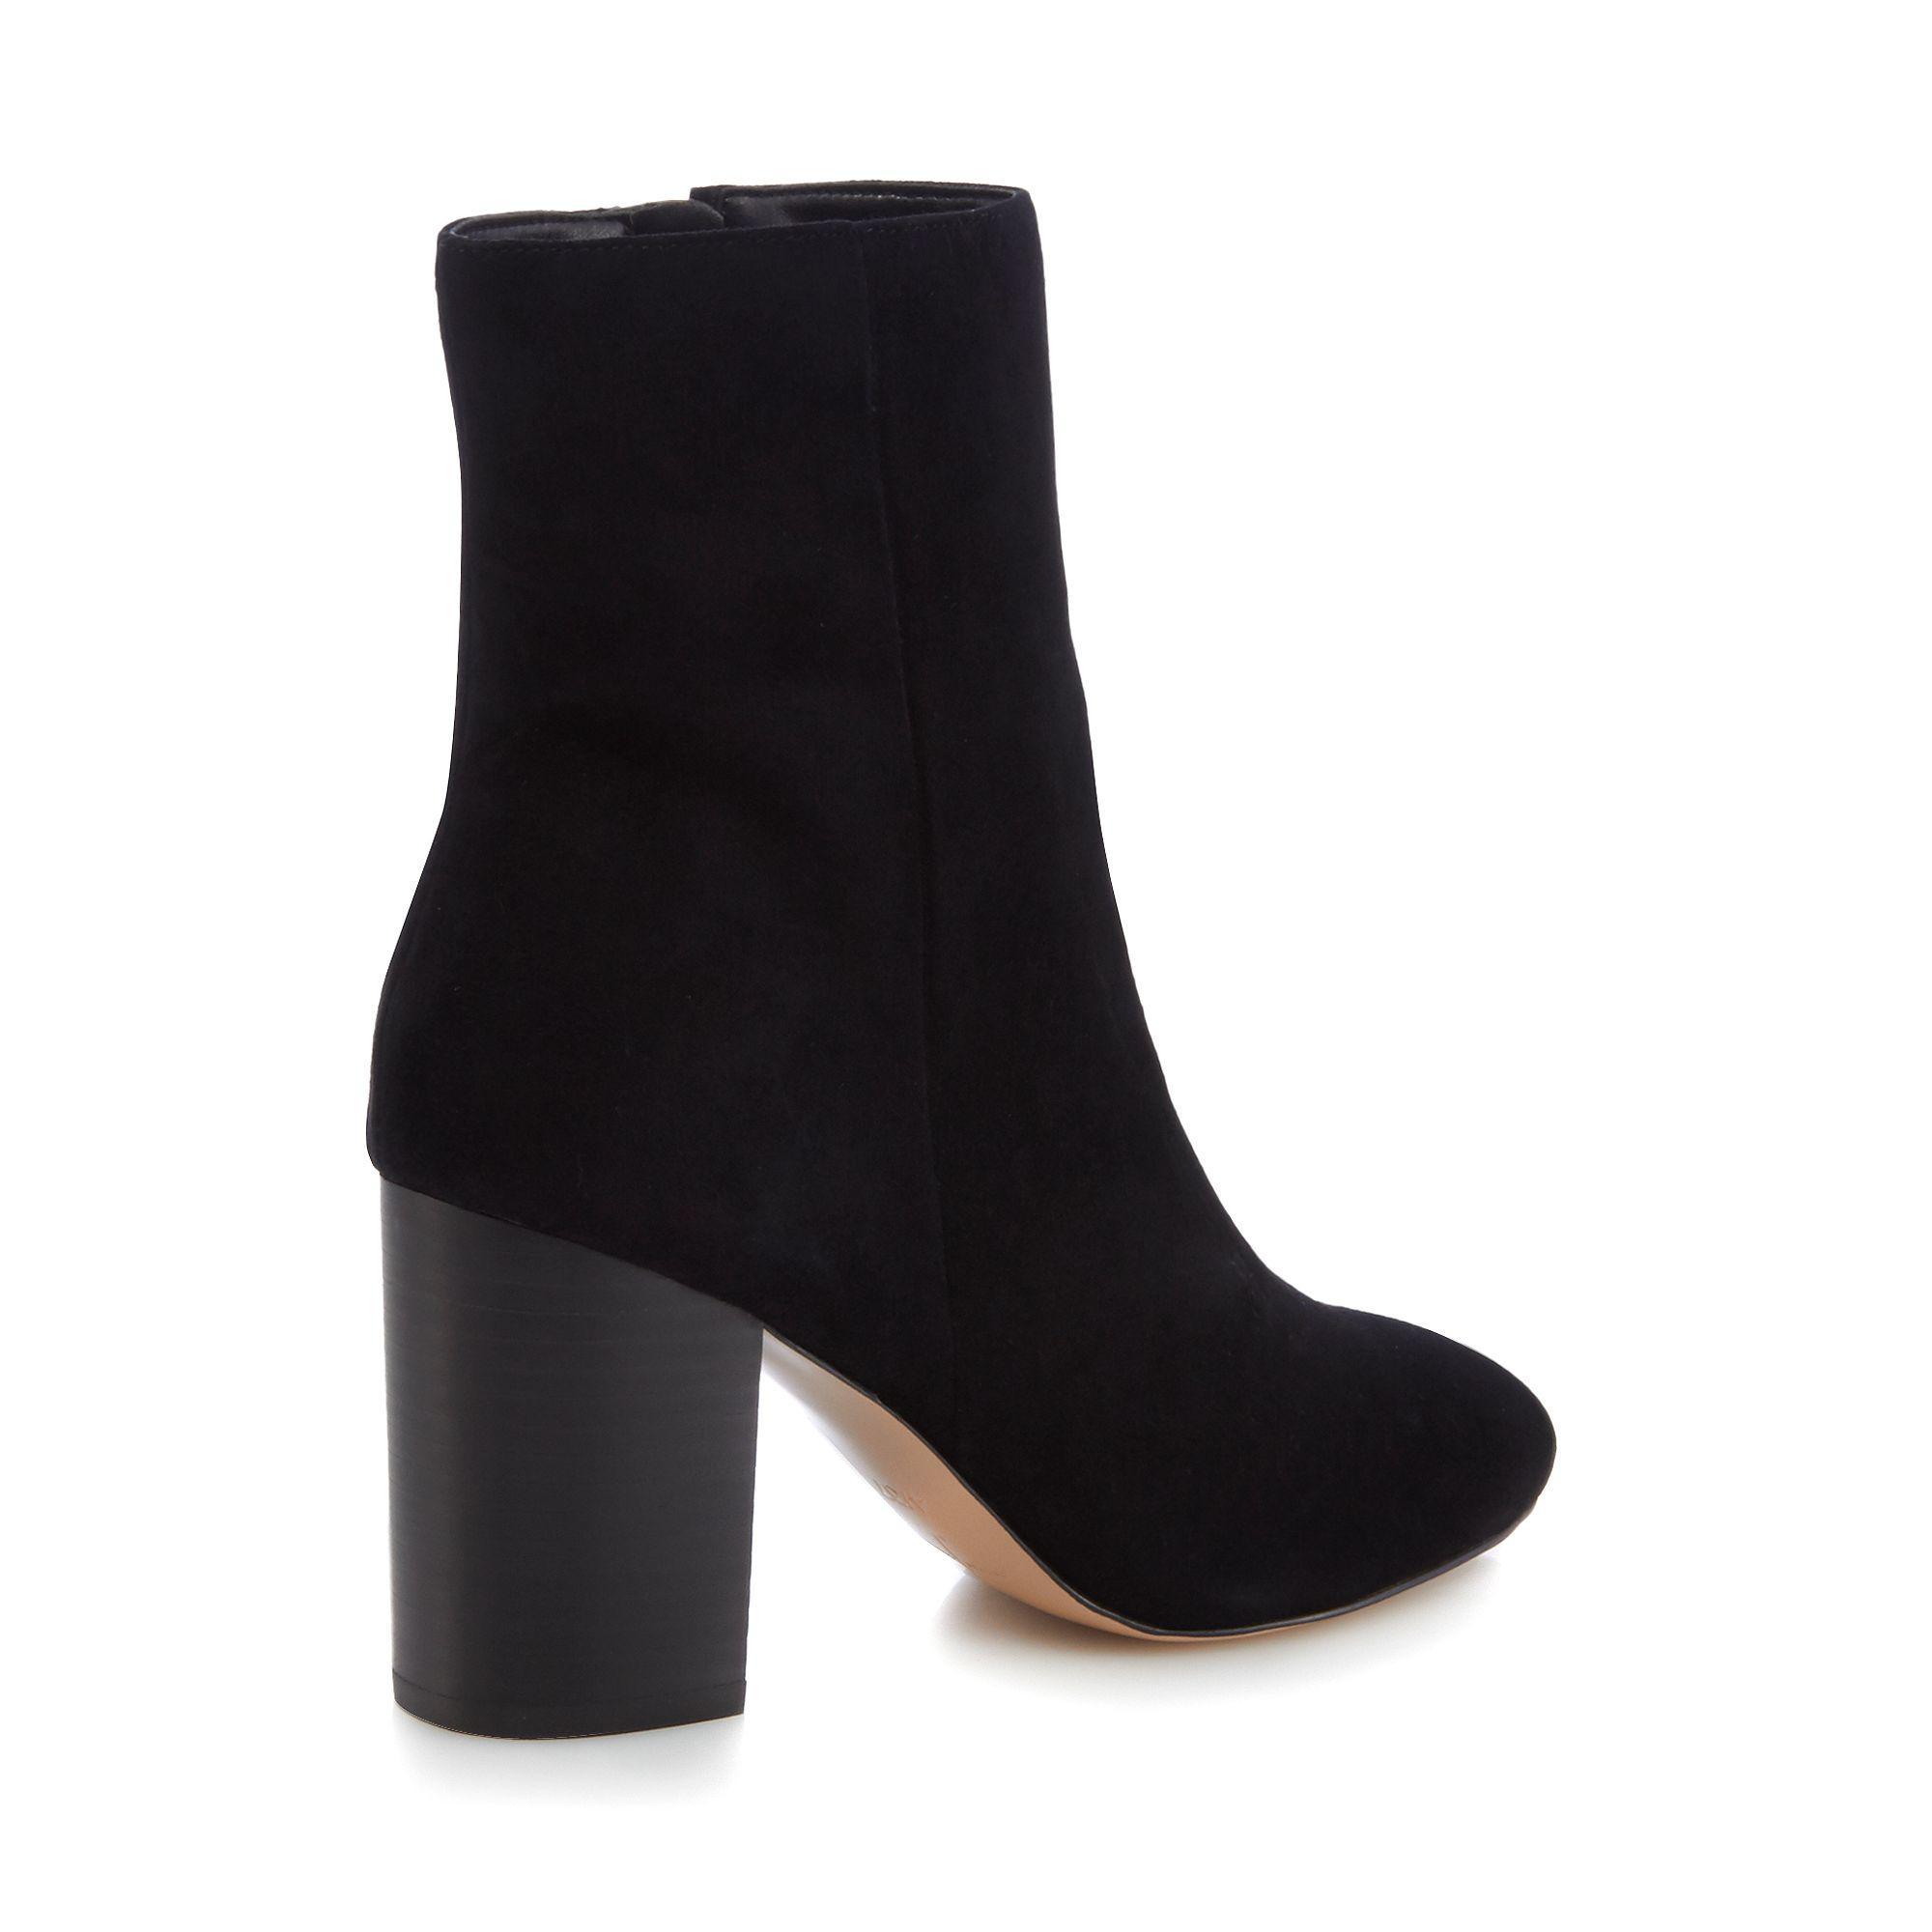 J By Jasper Conran Black Suede 'jones' High Block Heel Ankle Boots